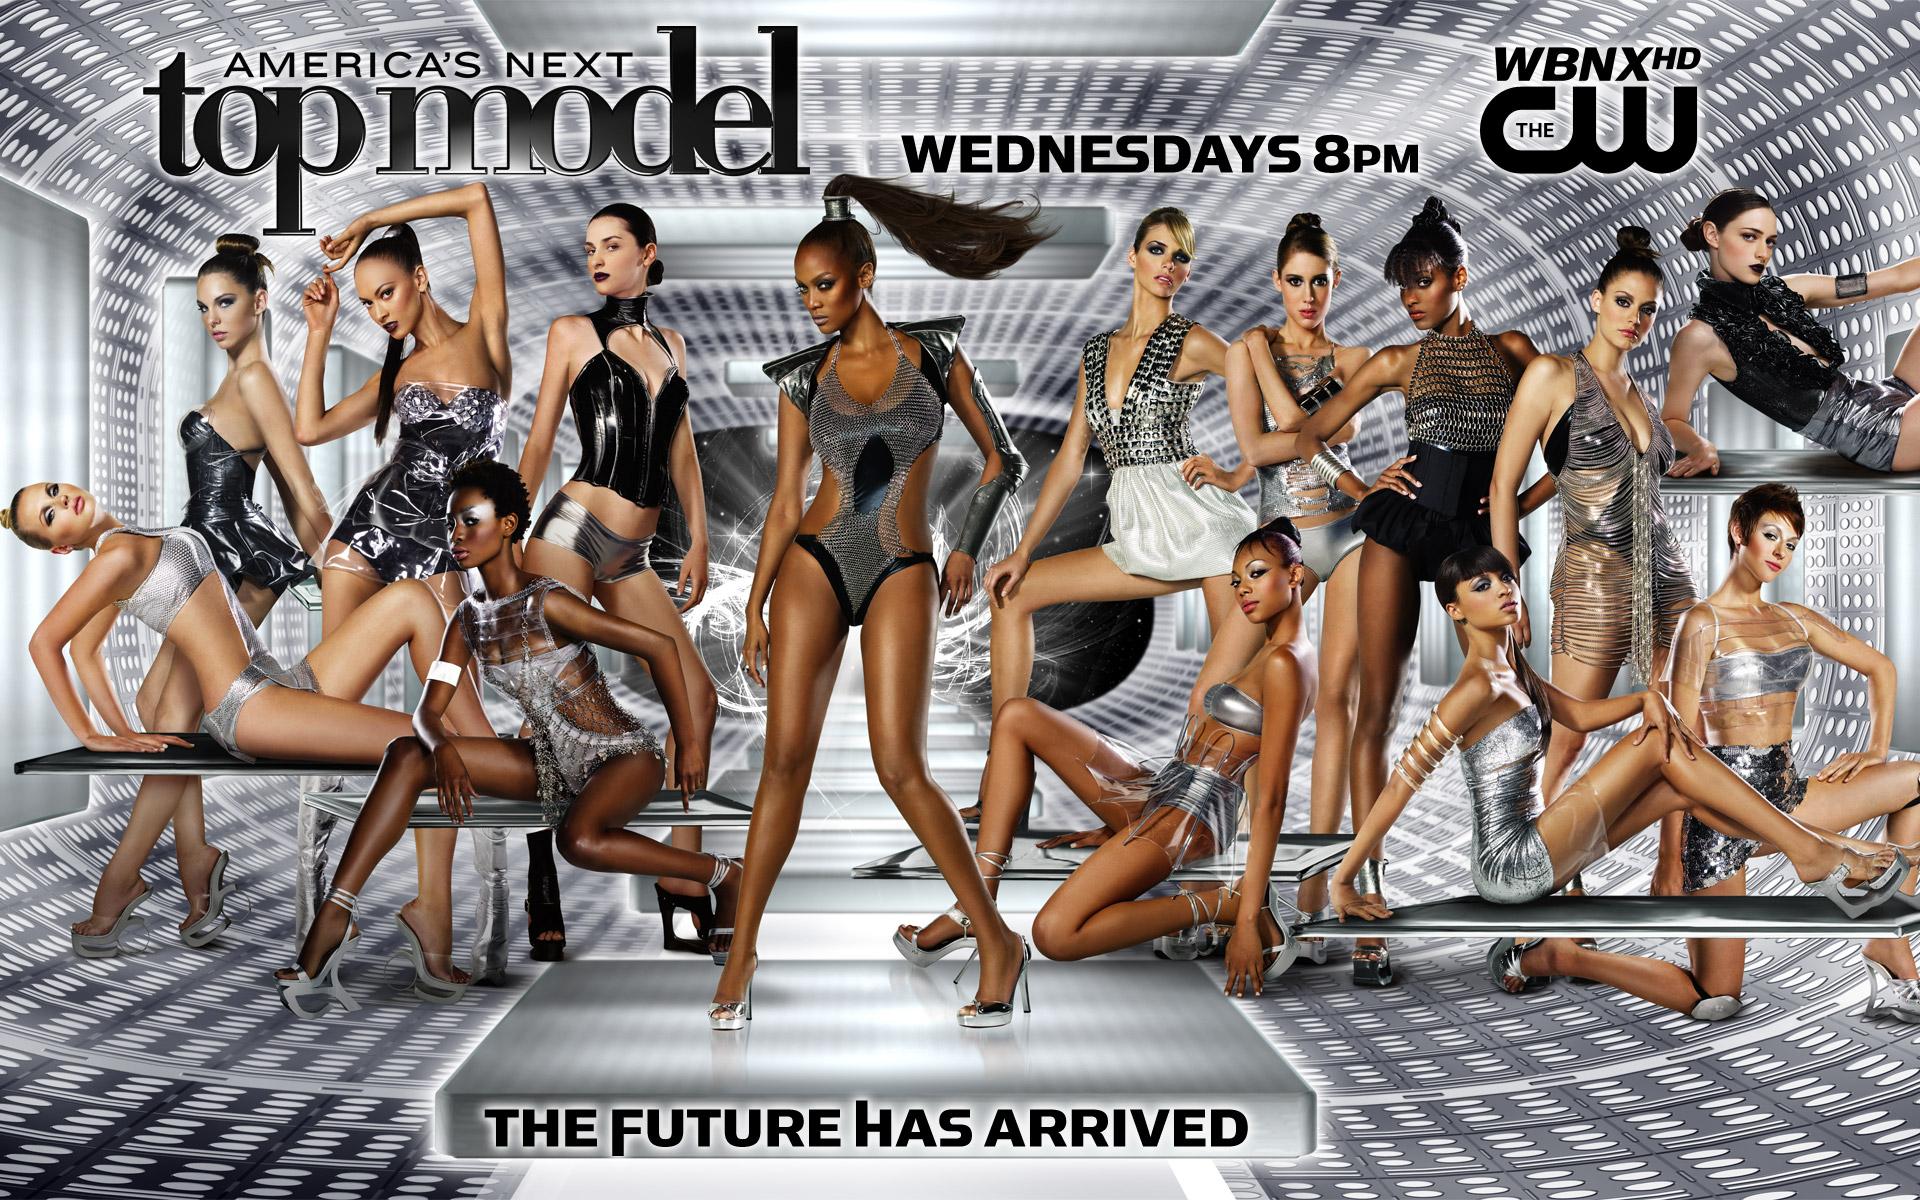 http://wacowla.com/wp-content/uploads//2012/05/topmodel9.jpg